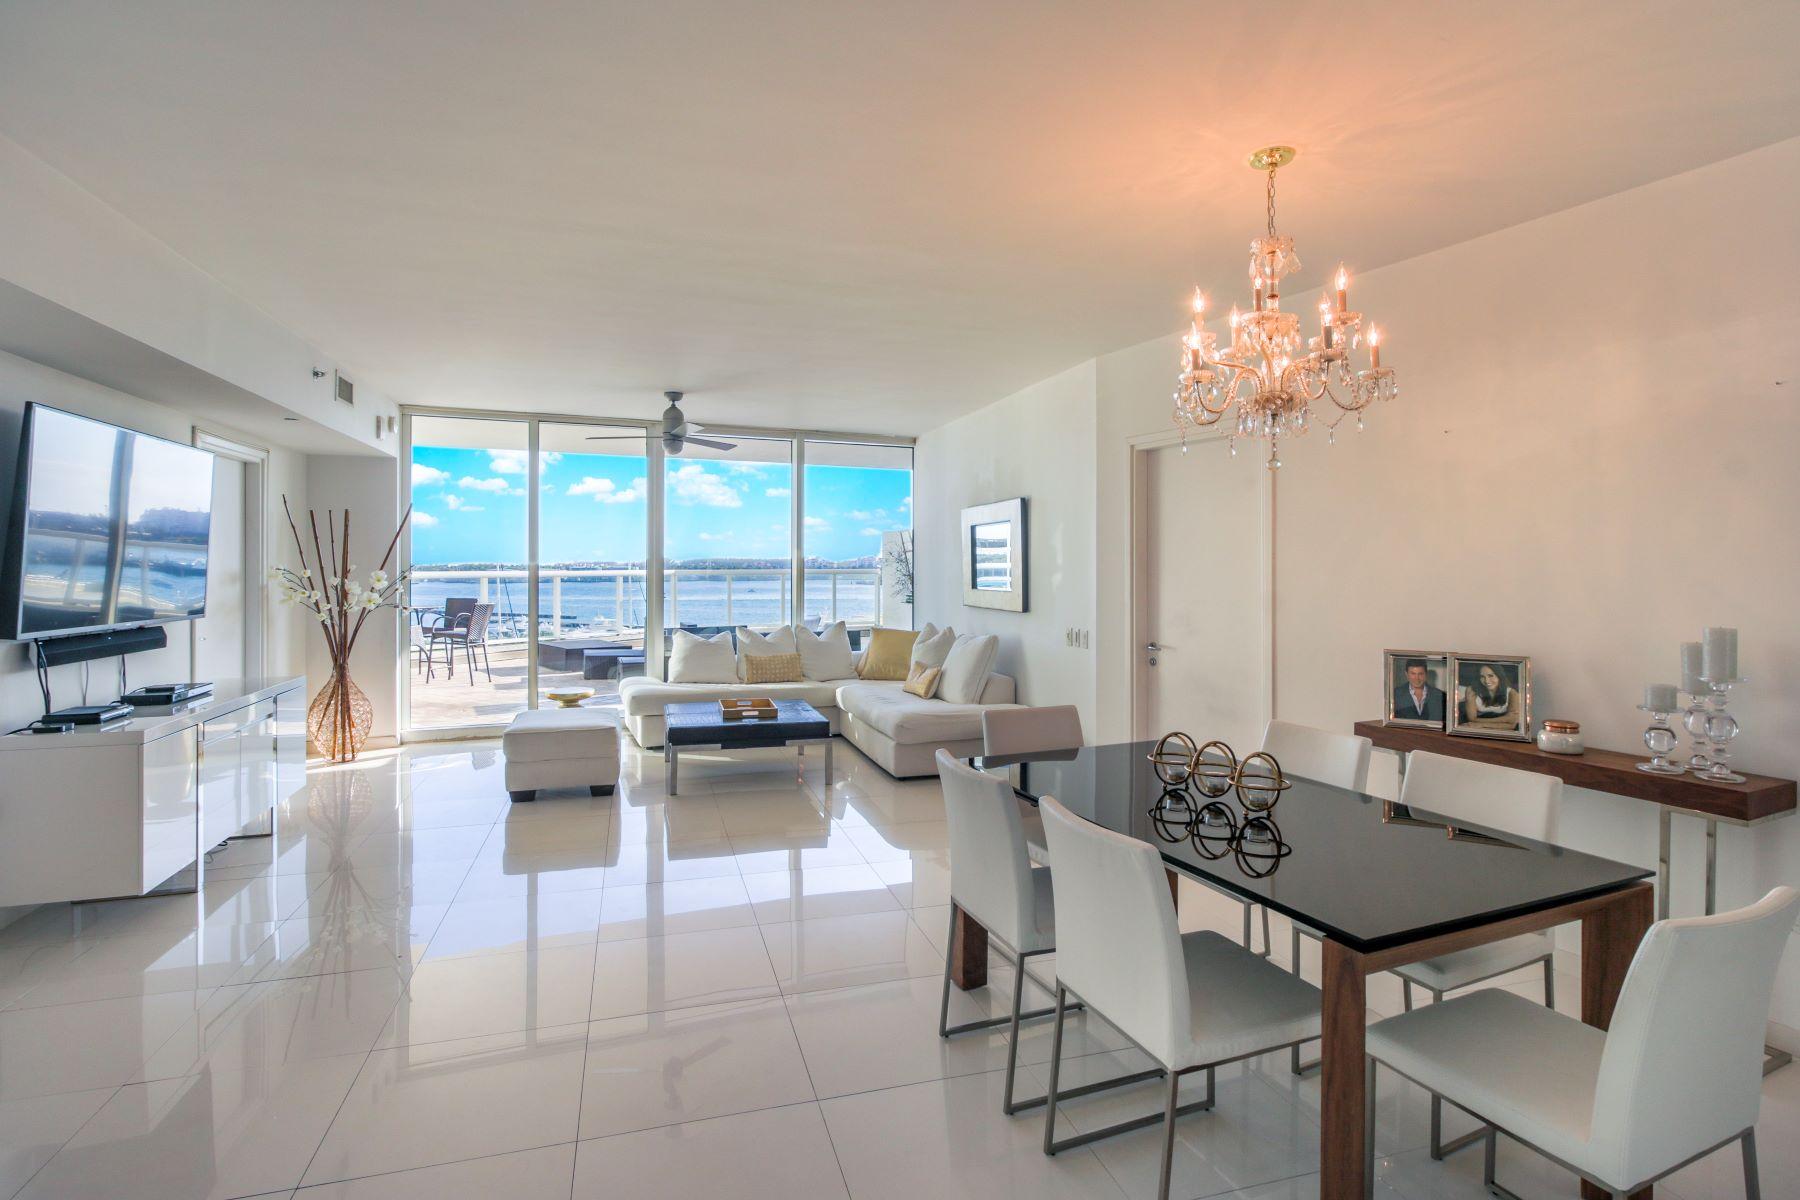 Condominium for Sale at 450 Alton Rd #605 450 Alton Rd 605 Miami Beach, Florida, 33139 United States